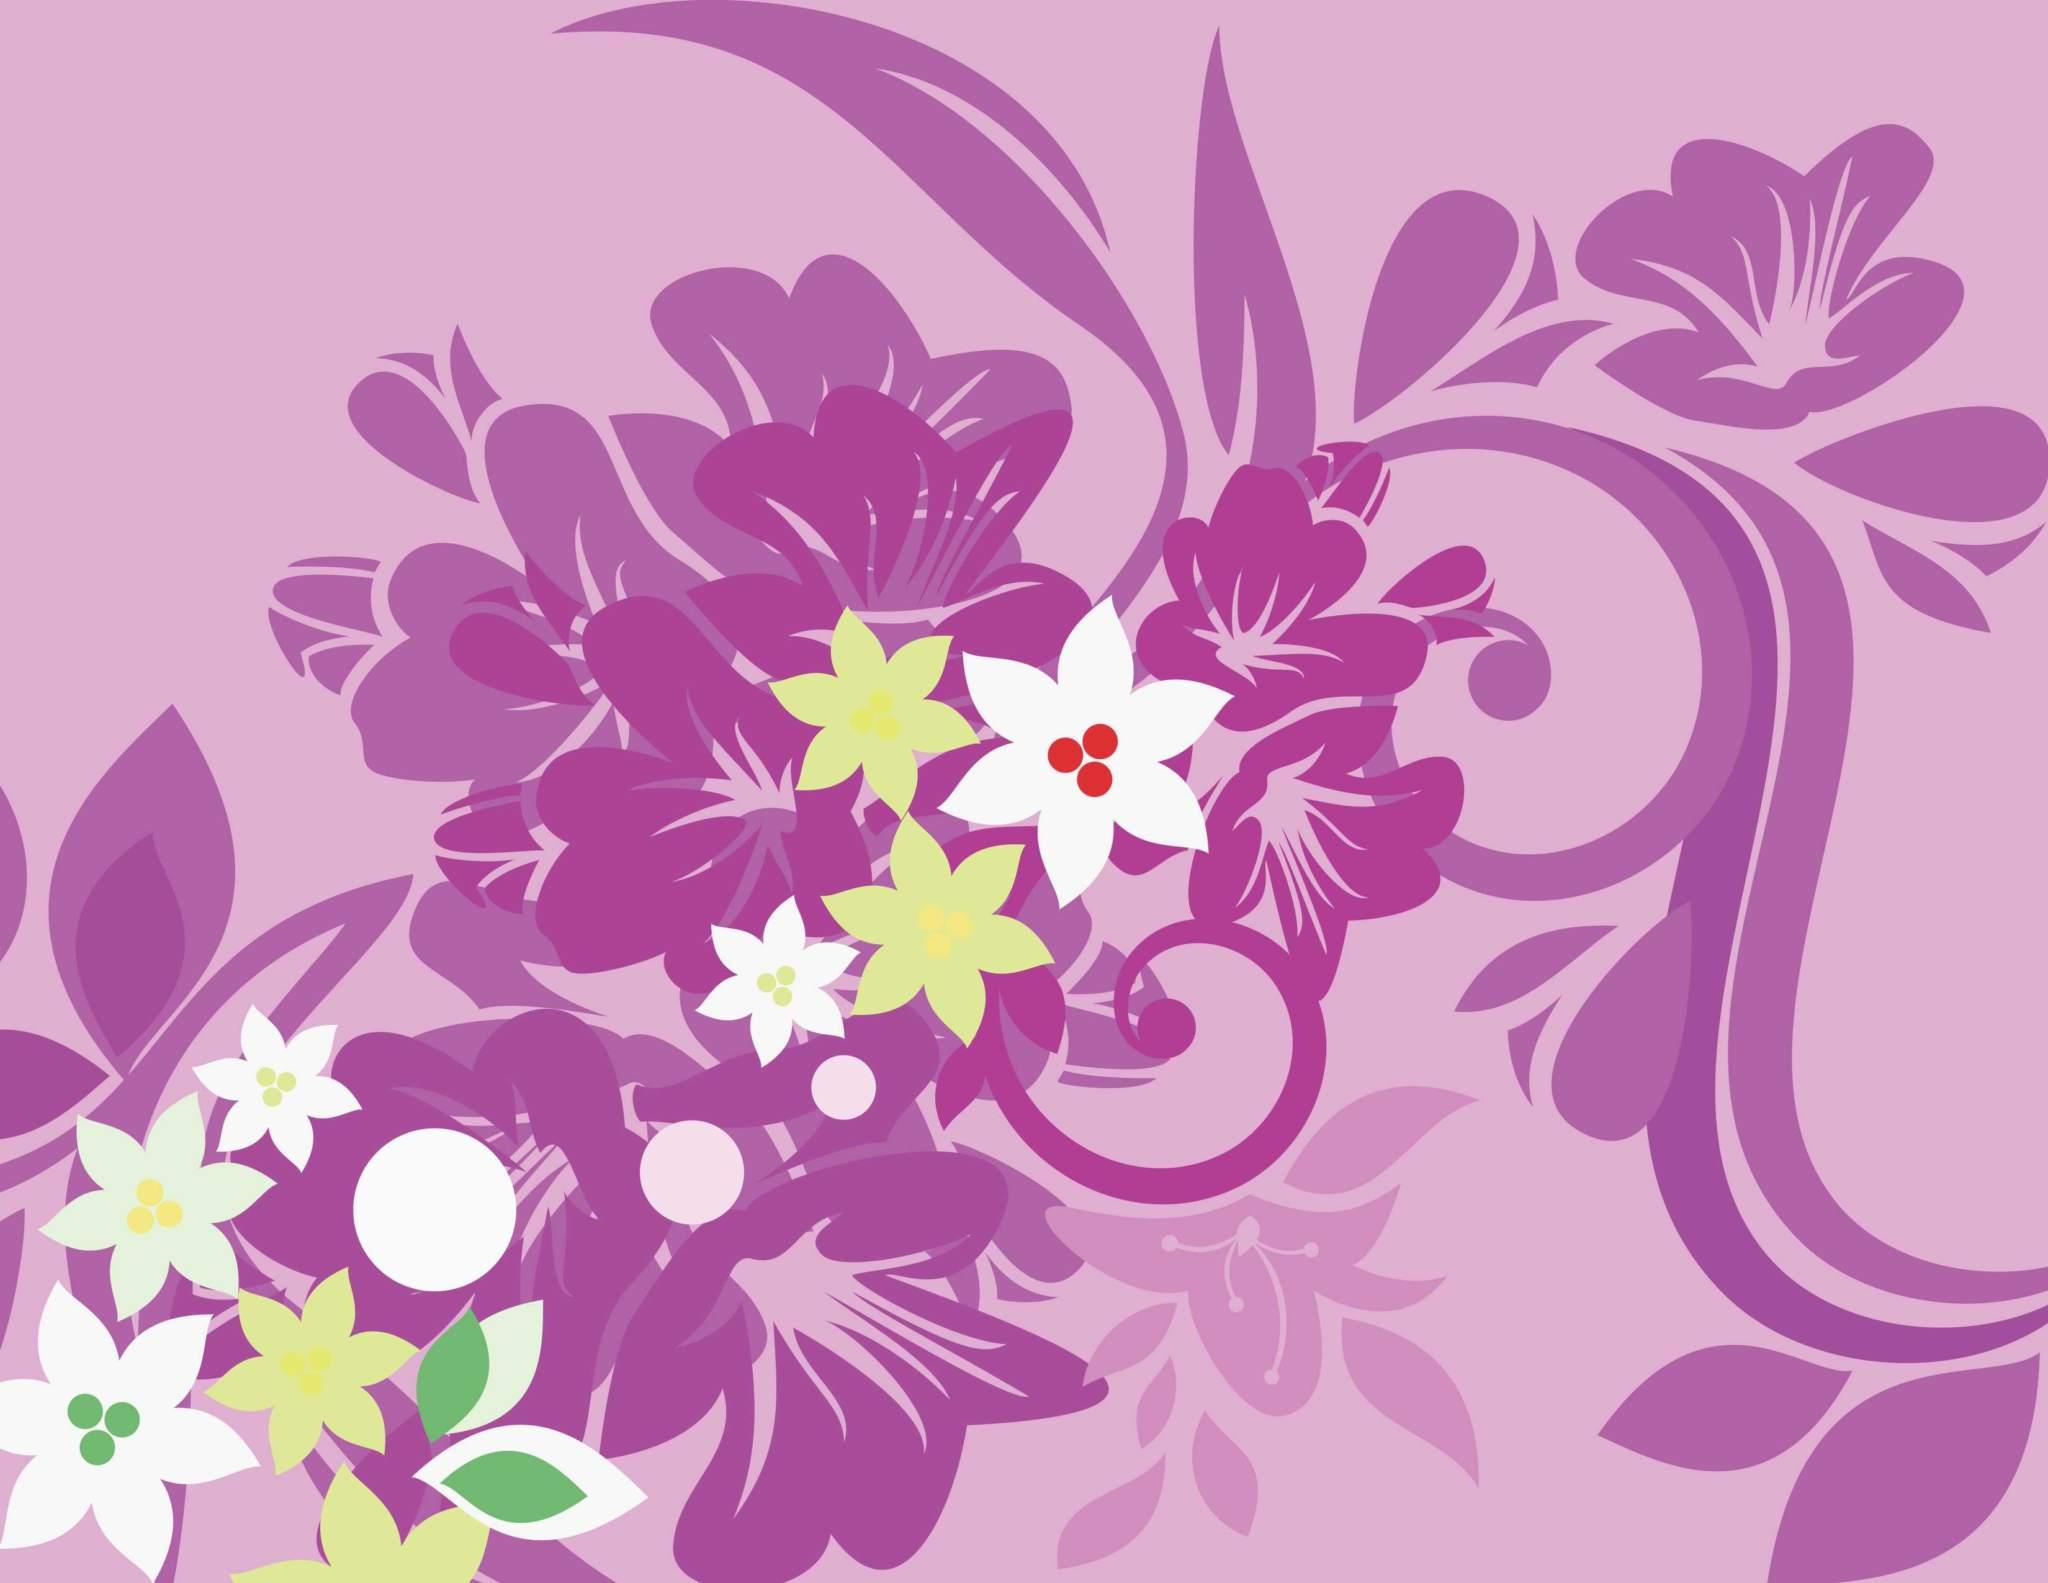 2048x1583 Floral Vector Design Background Pattern Cdr File Free Download